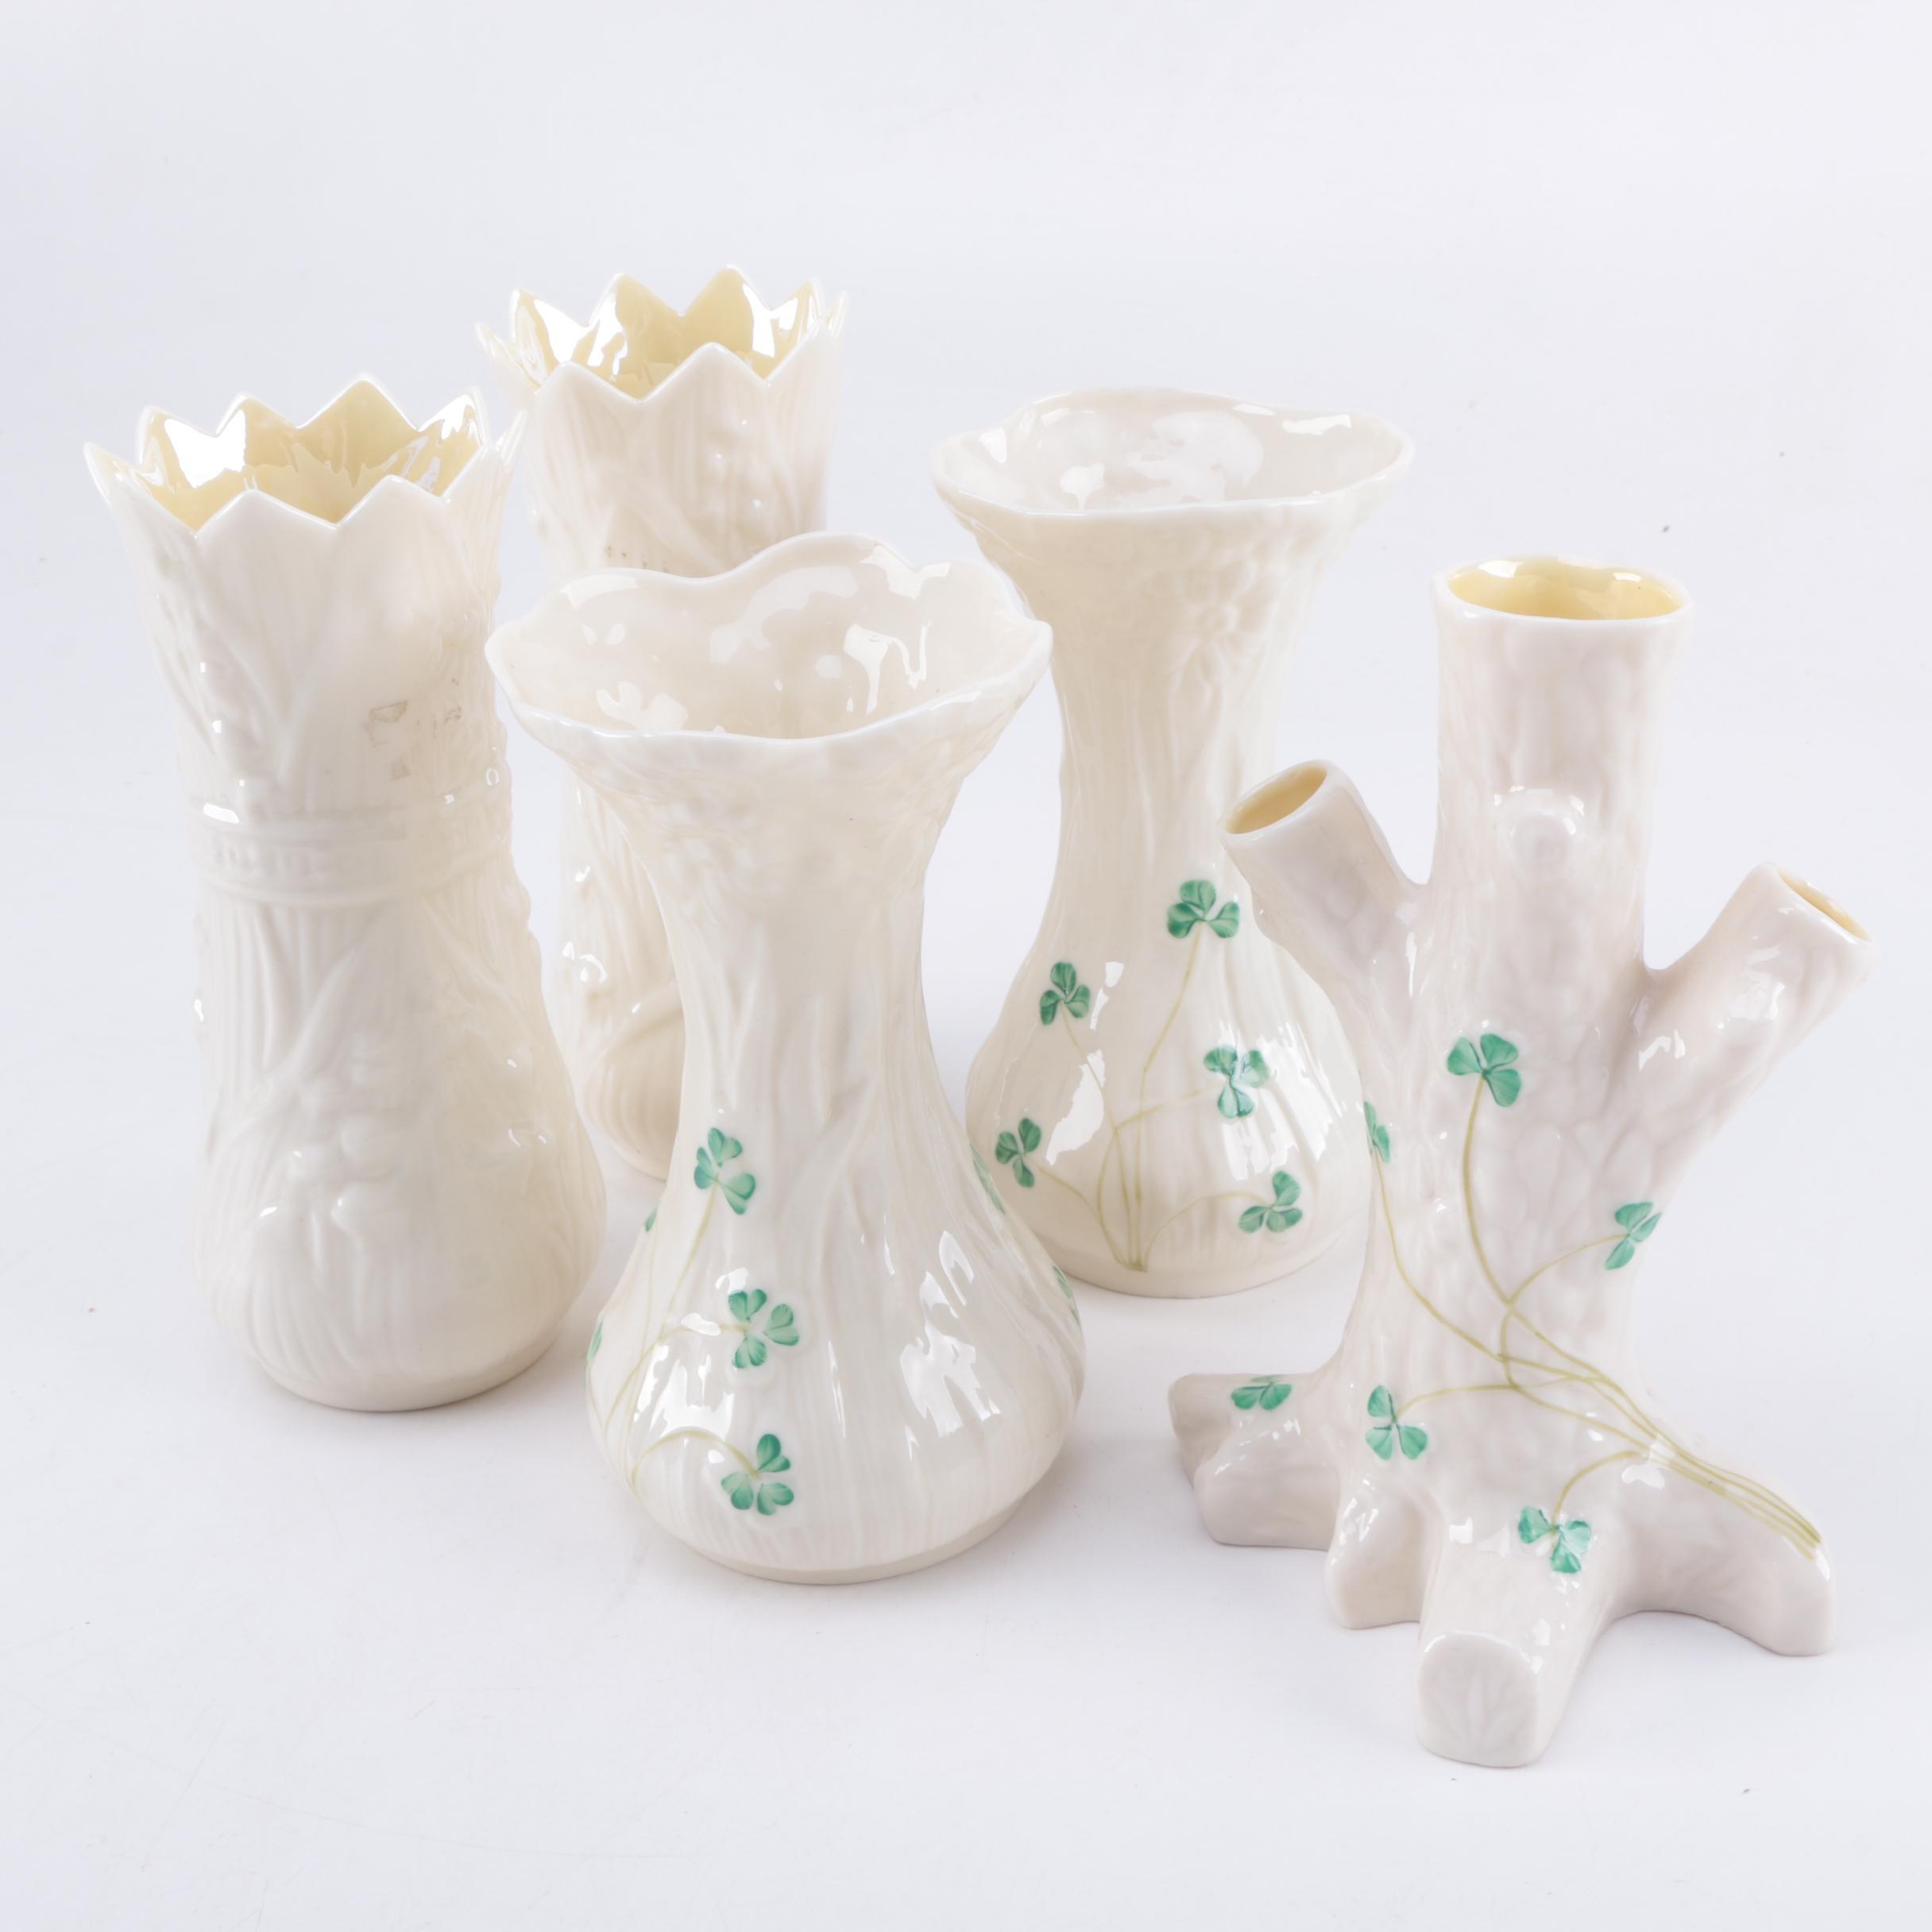 Belleek Porcelain Bud Vases